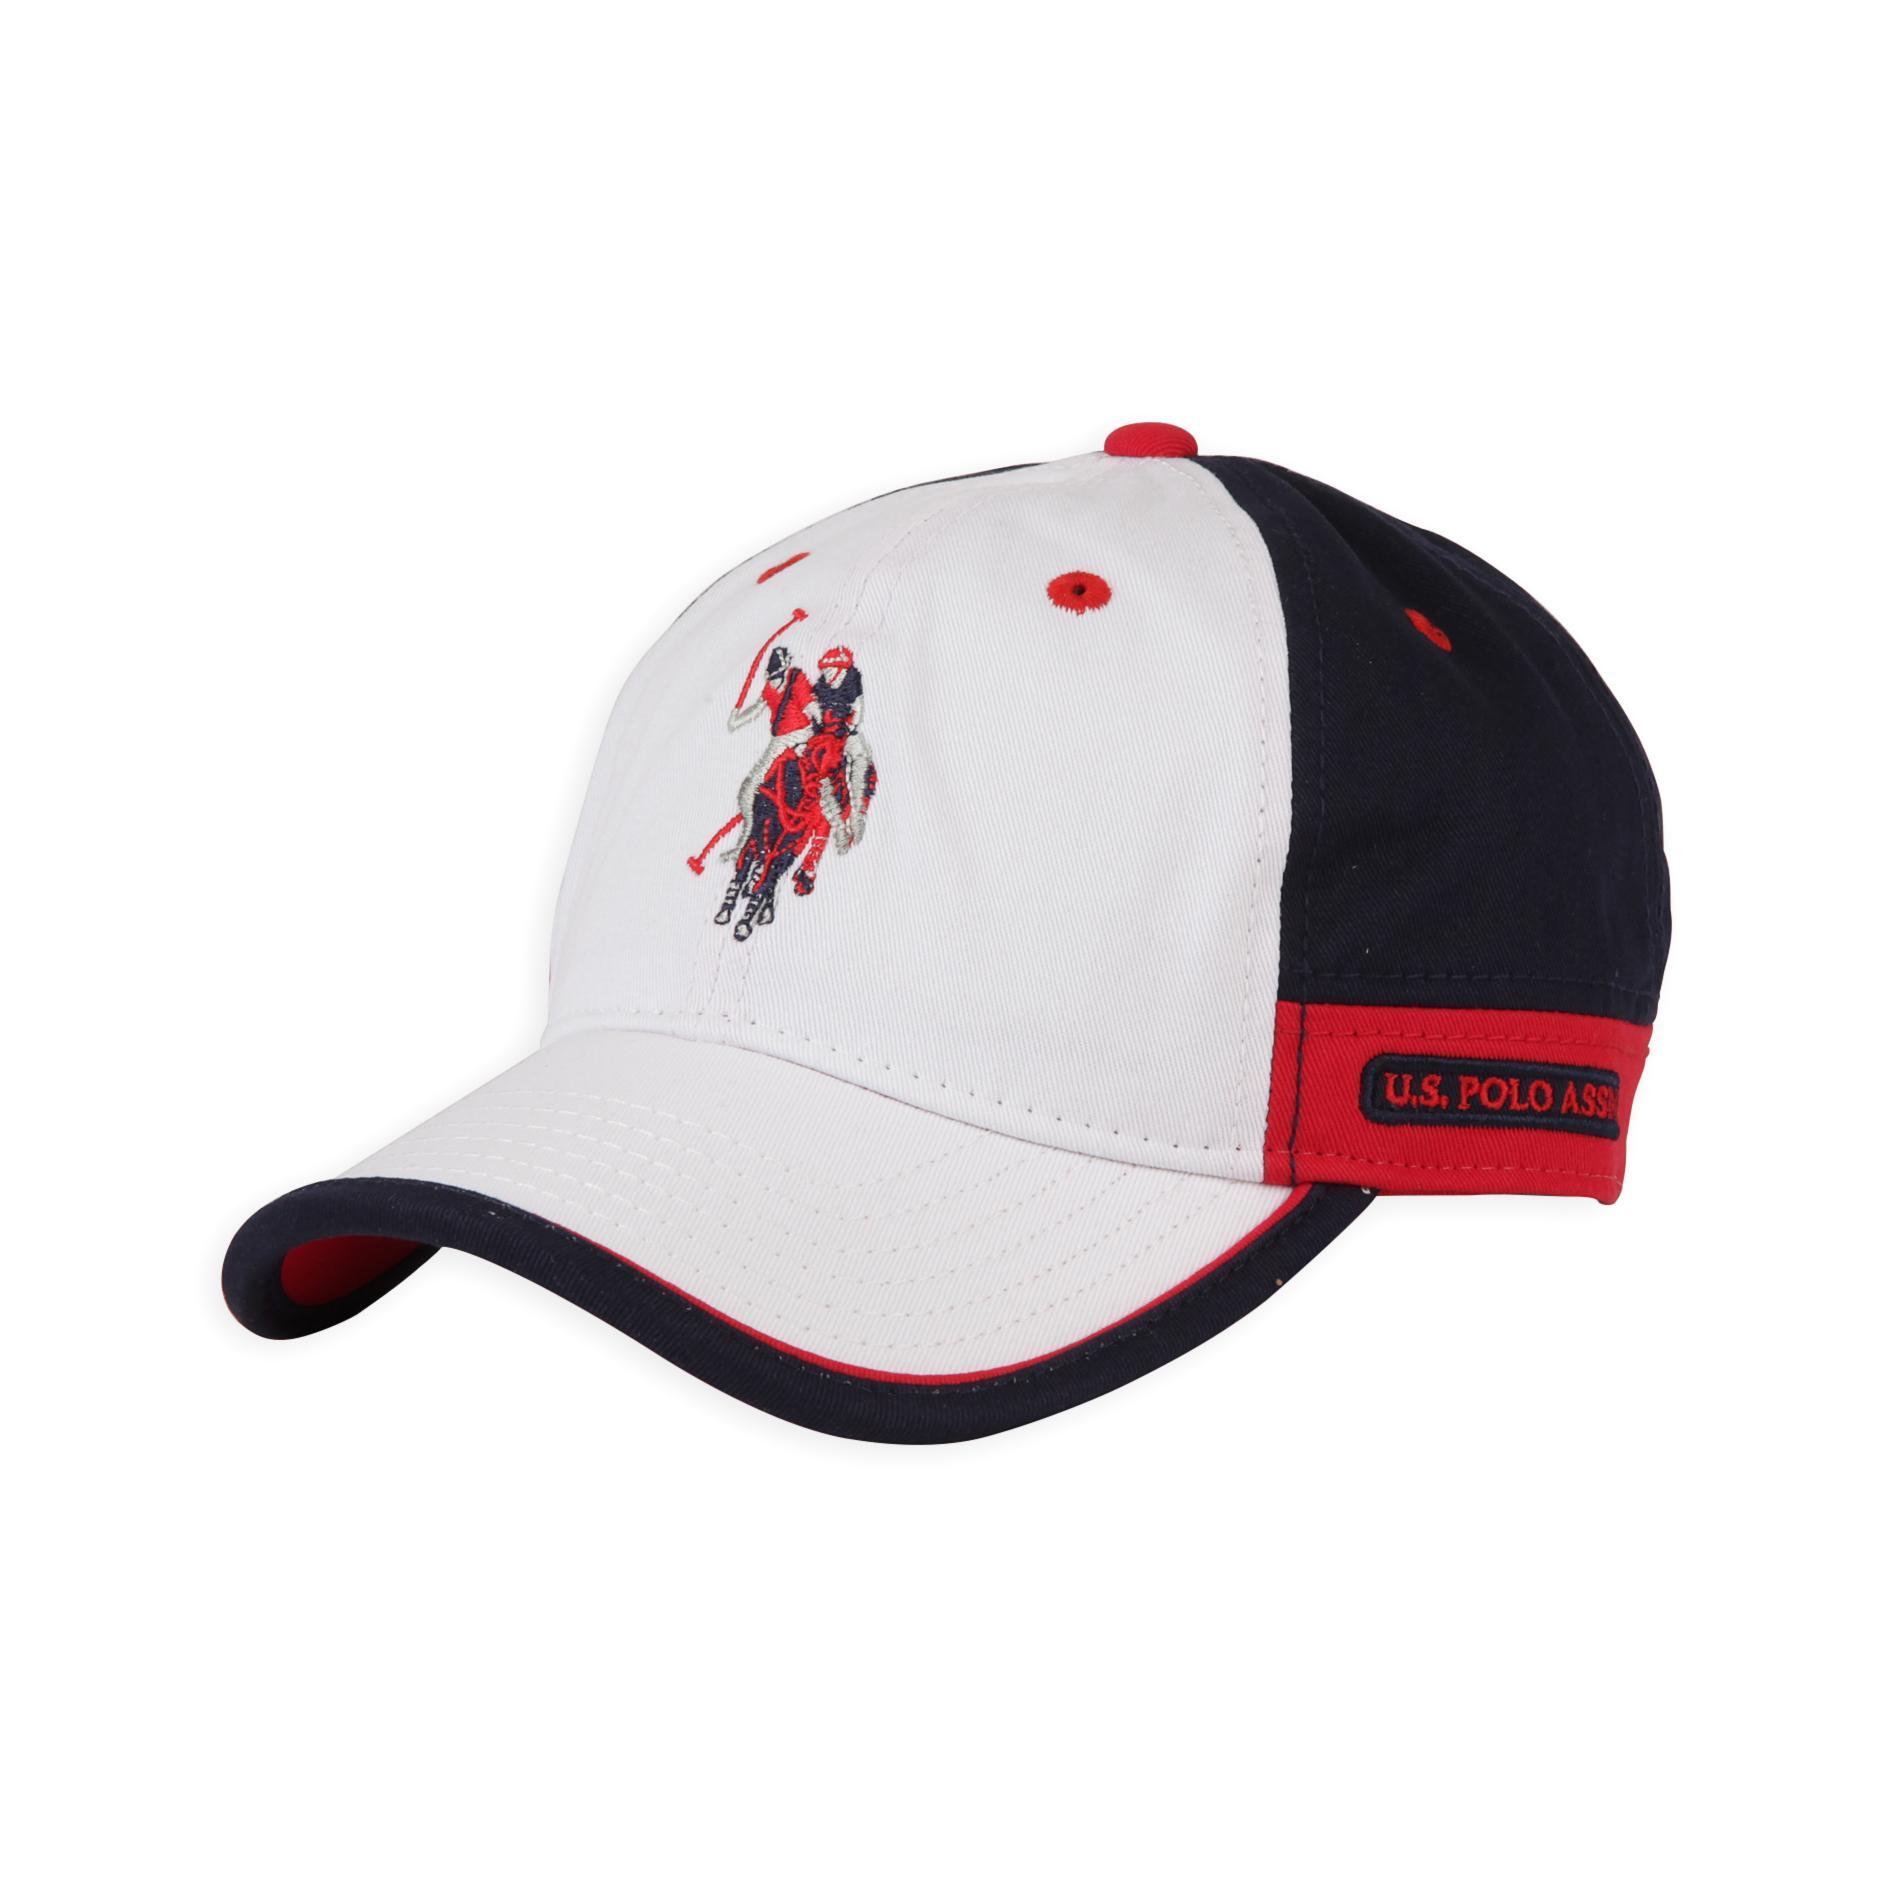 U.S. Polo Assn. Men s Polo Baseball Hat - Large Horse Logo 5b907a637e3